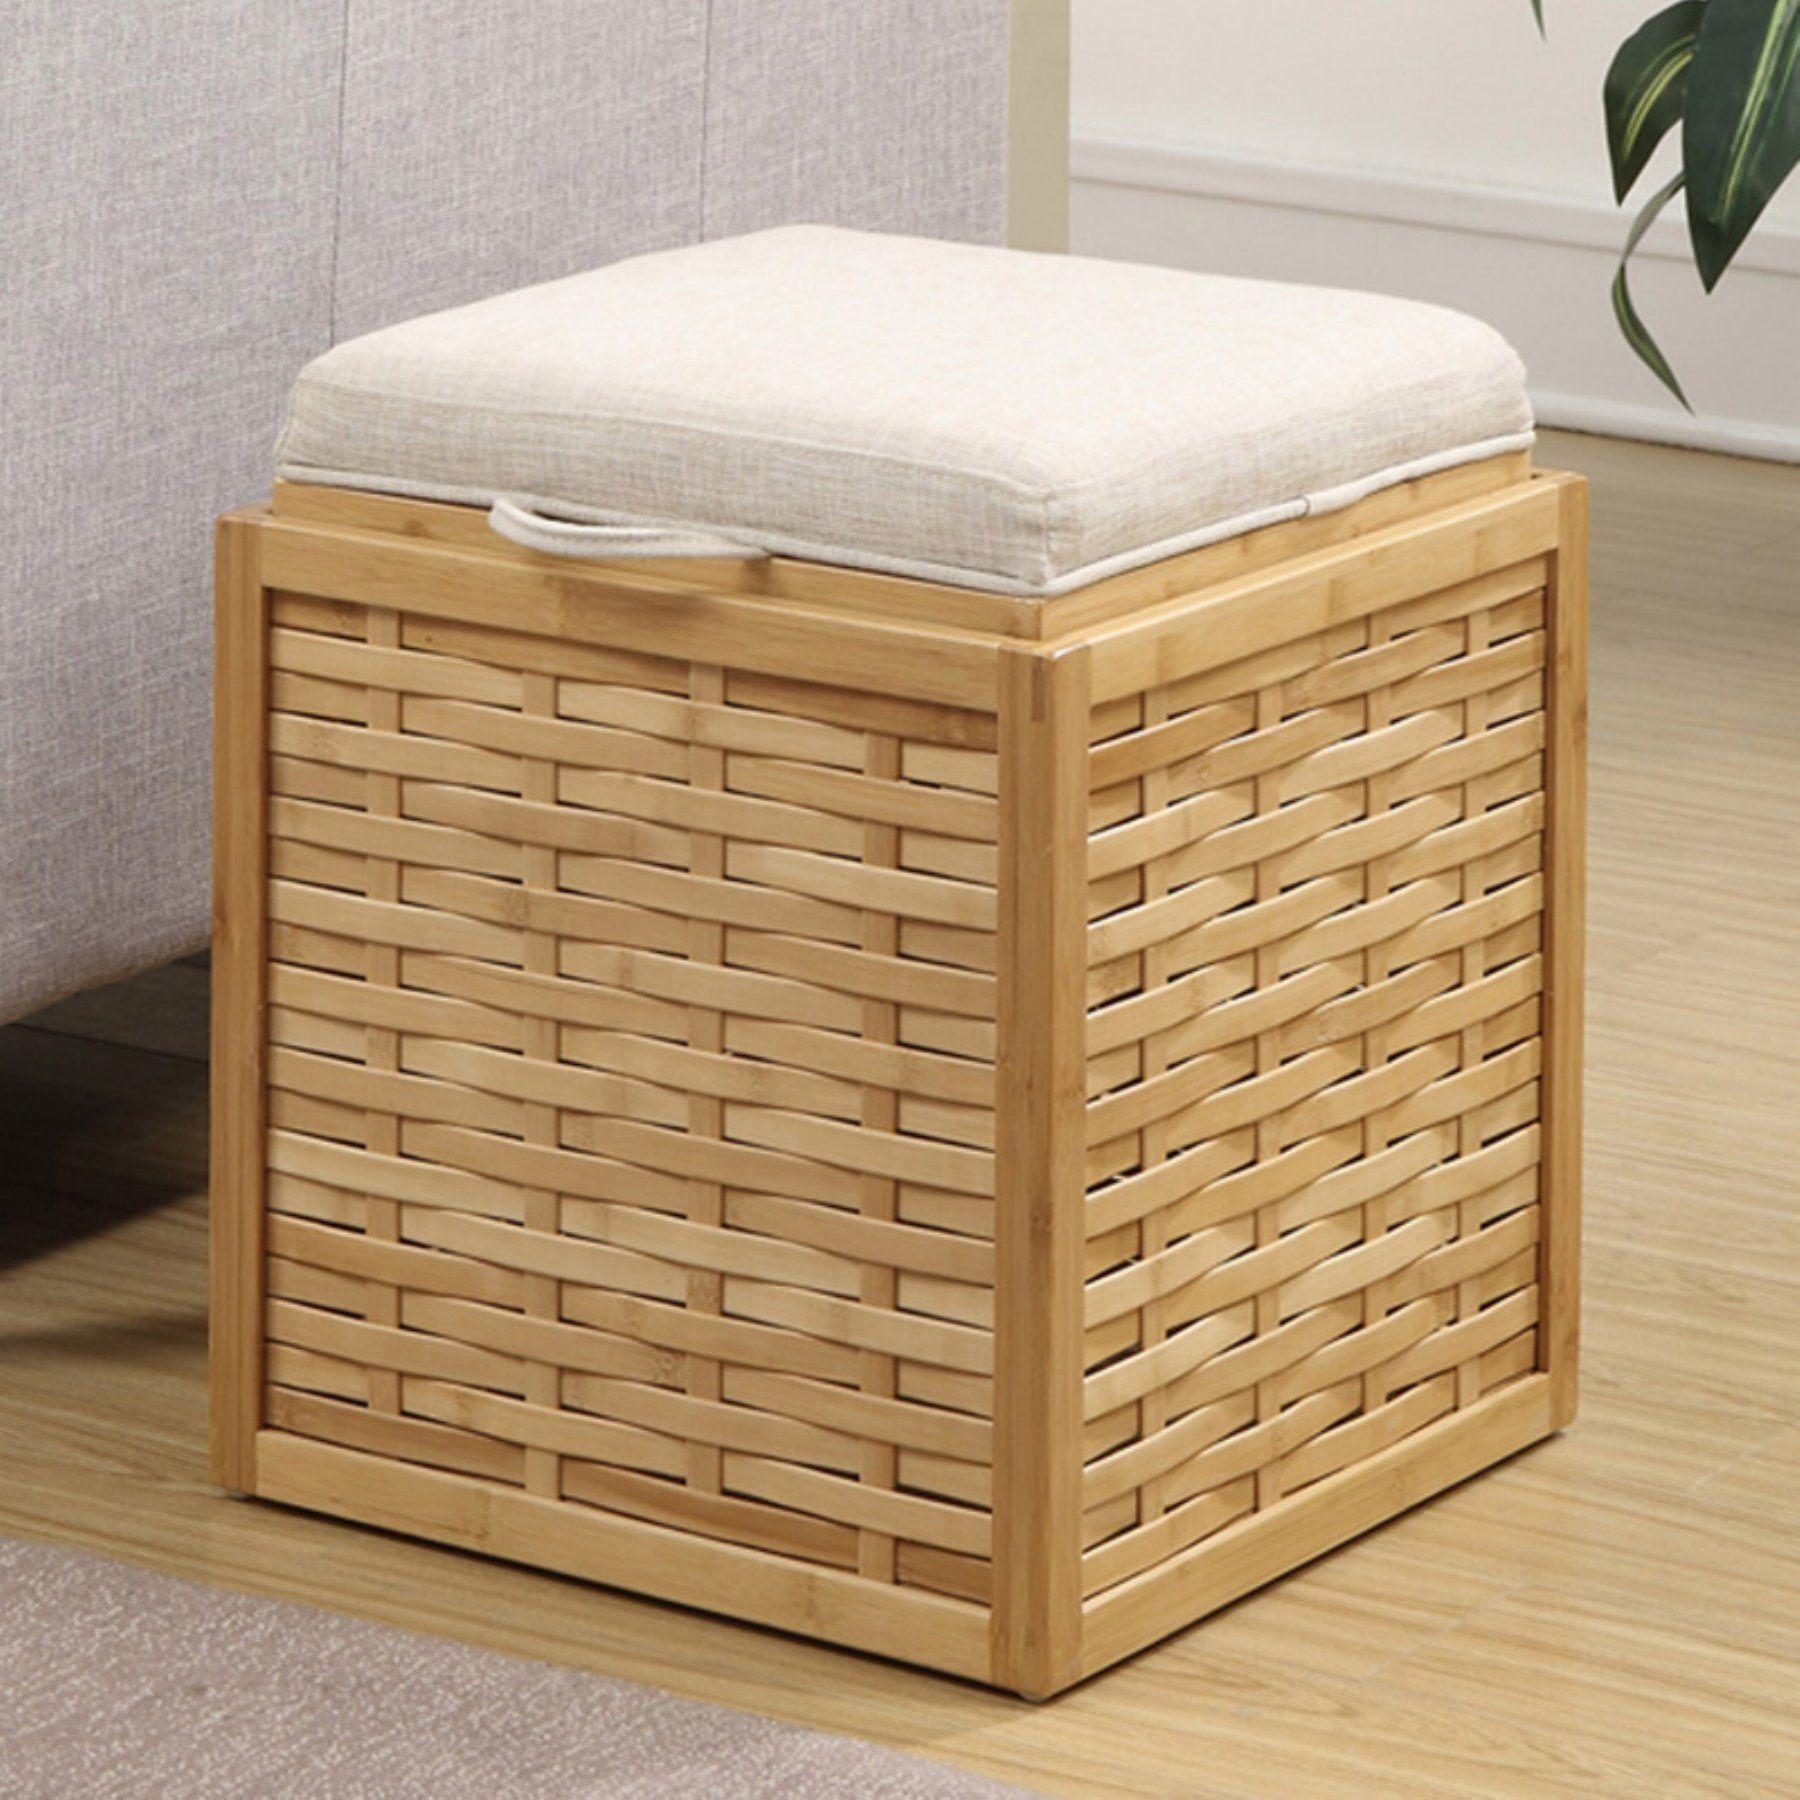 Surprising Convenience Concepts Weave Bamboo Storage Ottoman 143630W Inzonedesignstudio Interior Chair Design Inzonedesignstudiocom